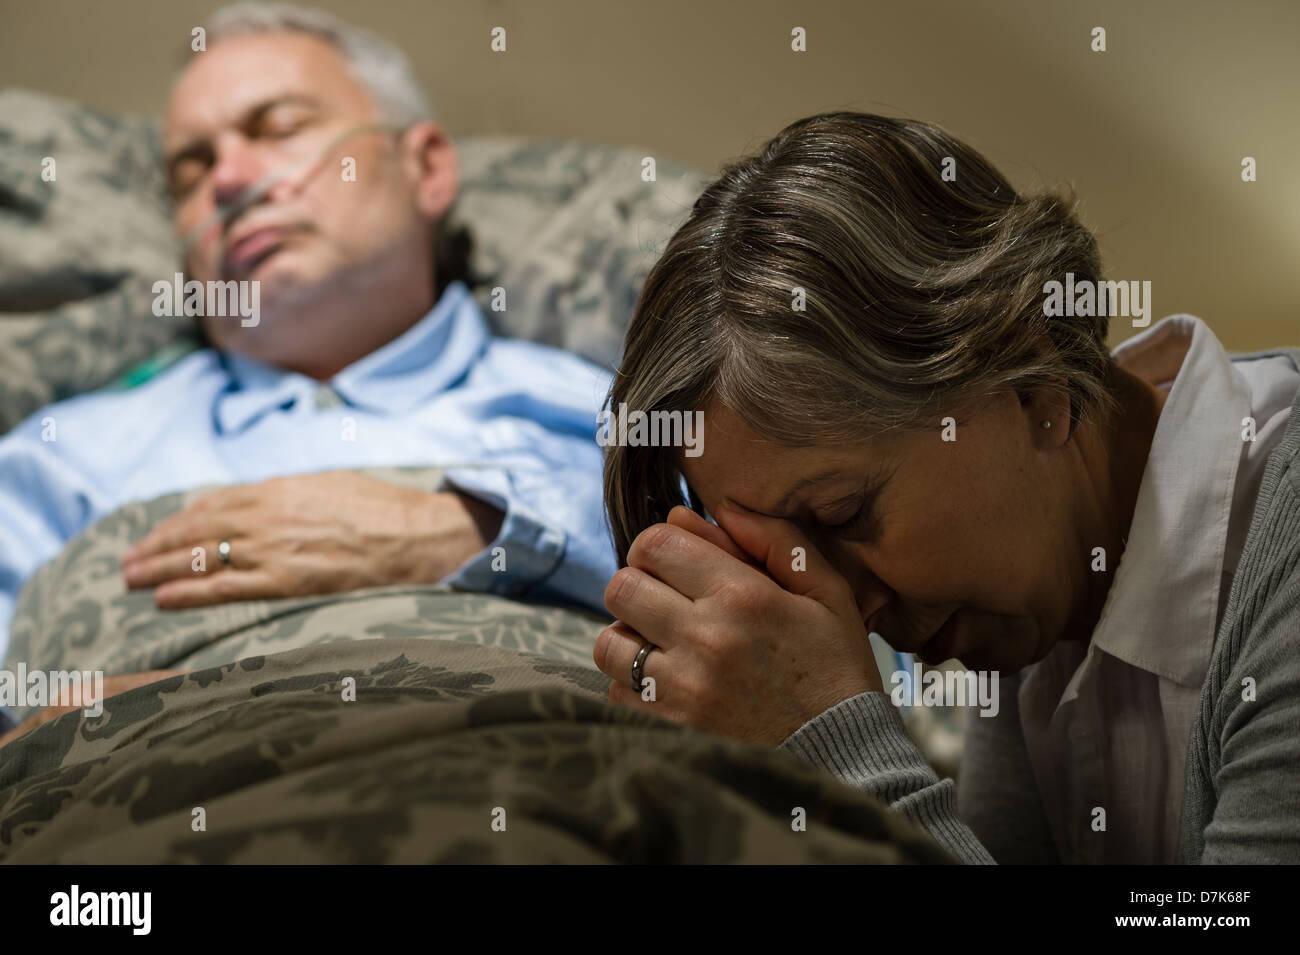 Senior woman praying for sick man sleeping in hospital bed Photo Stock